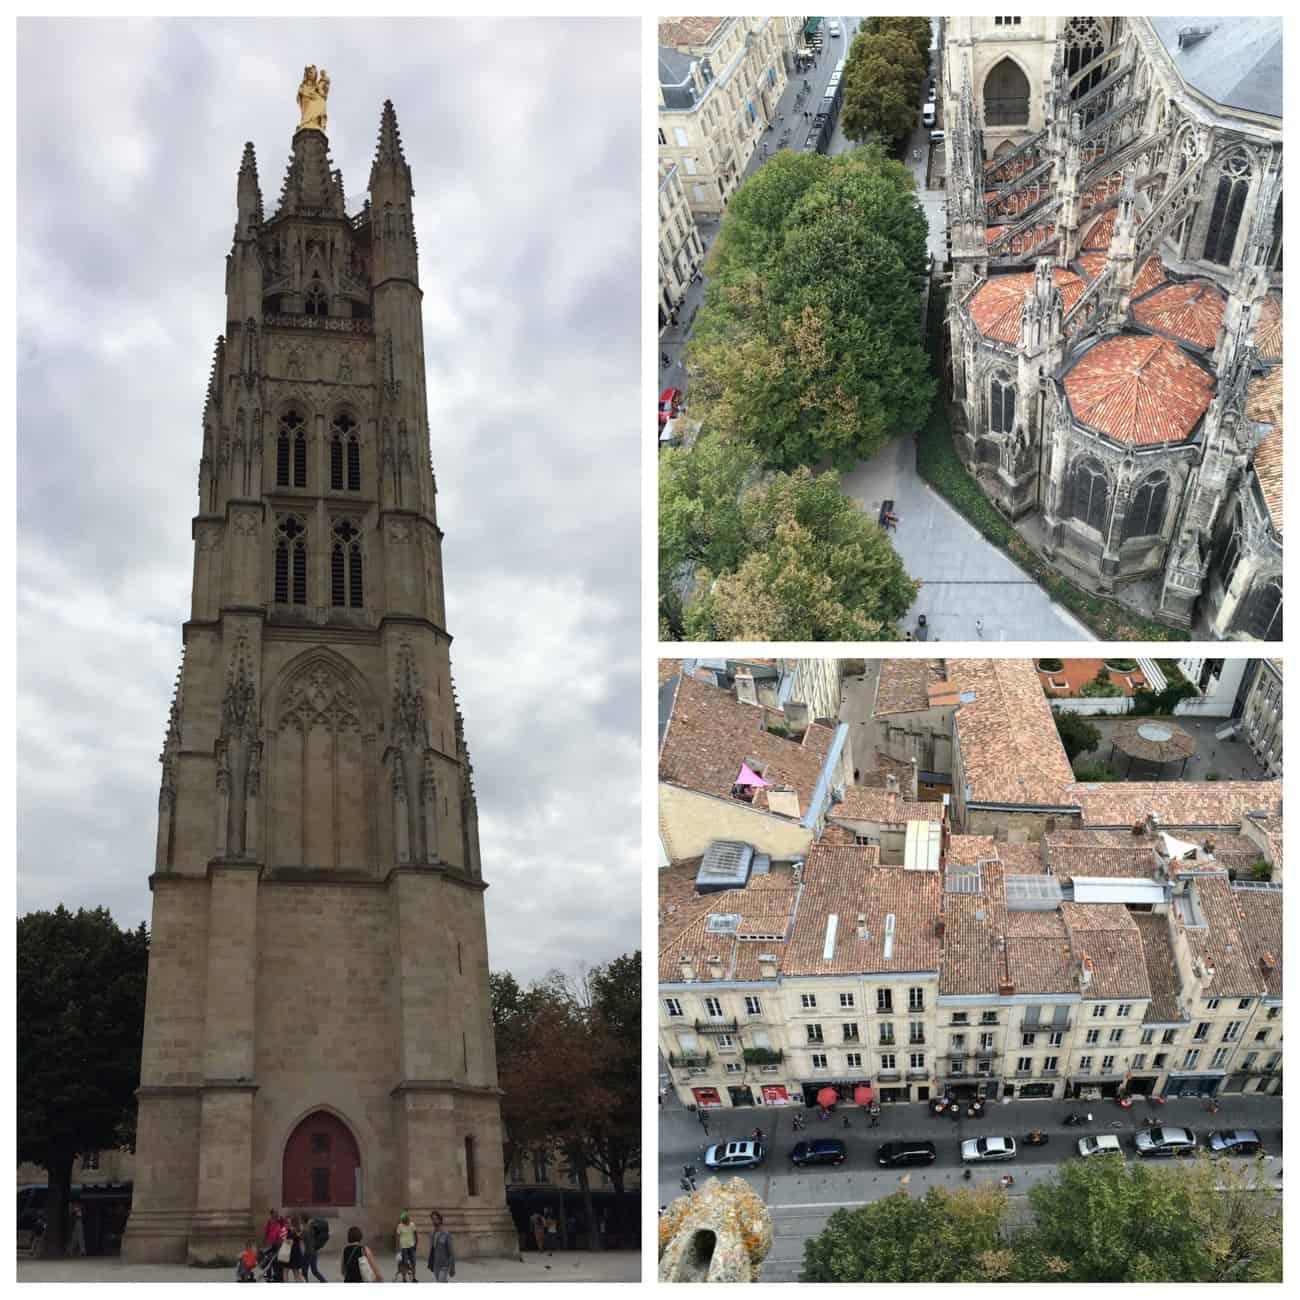 Bordeaux - Pey-Berland tower